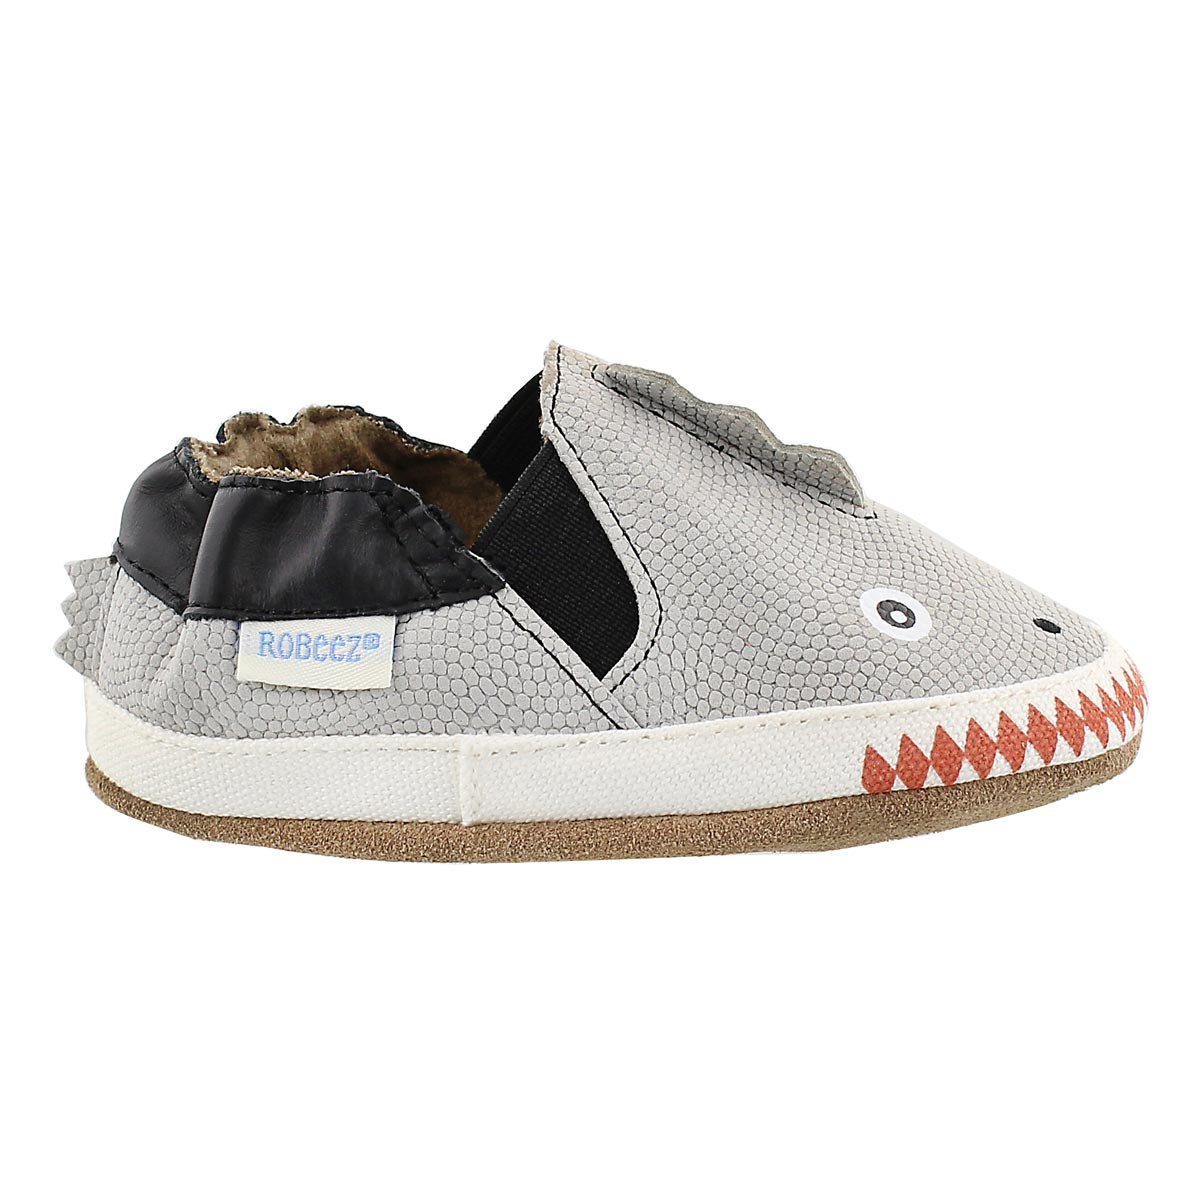 Pantoufle souple DinoDan,gris pâle, bébé